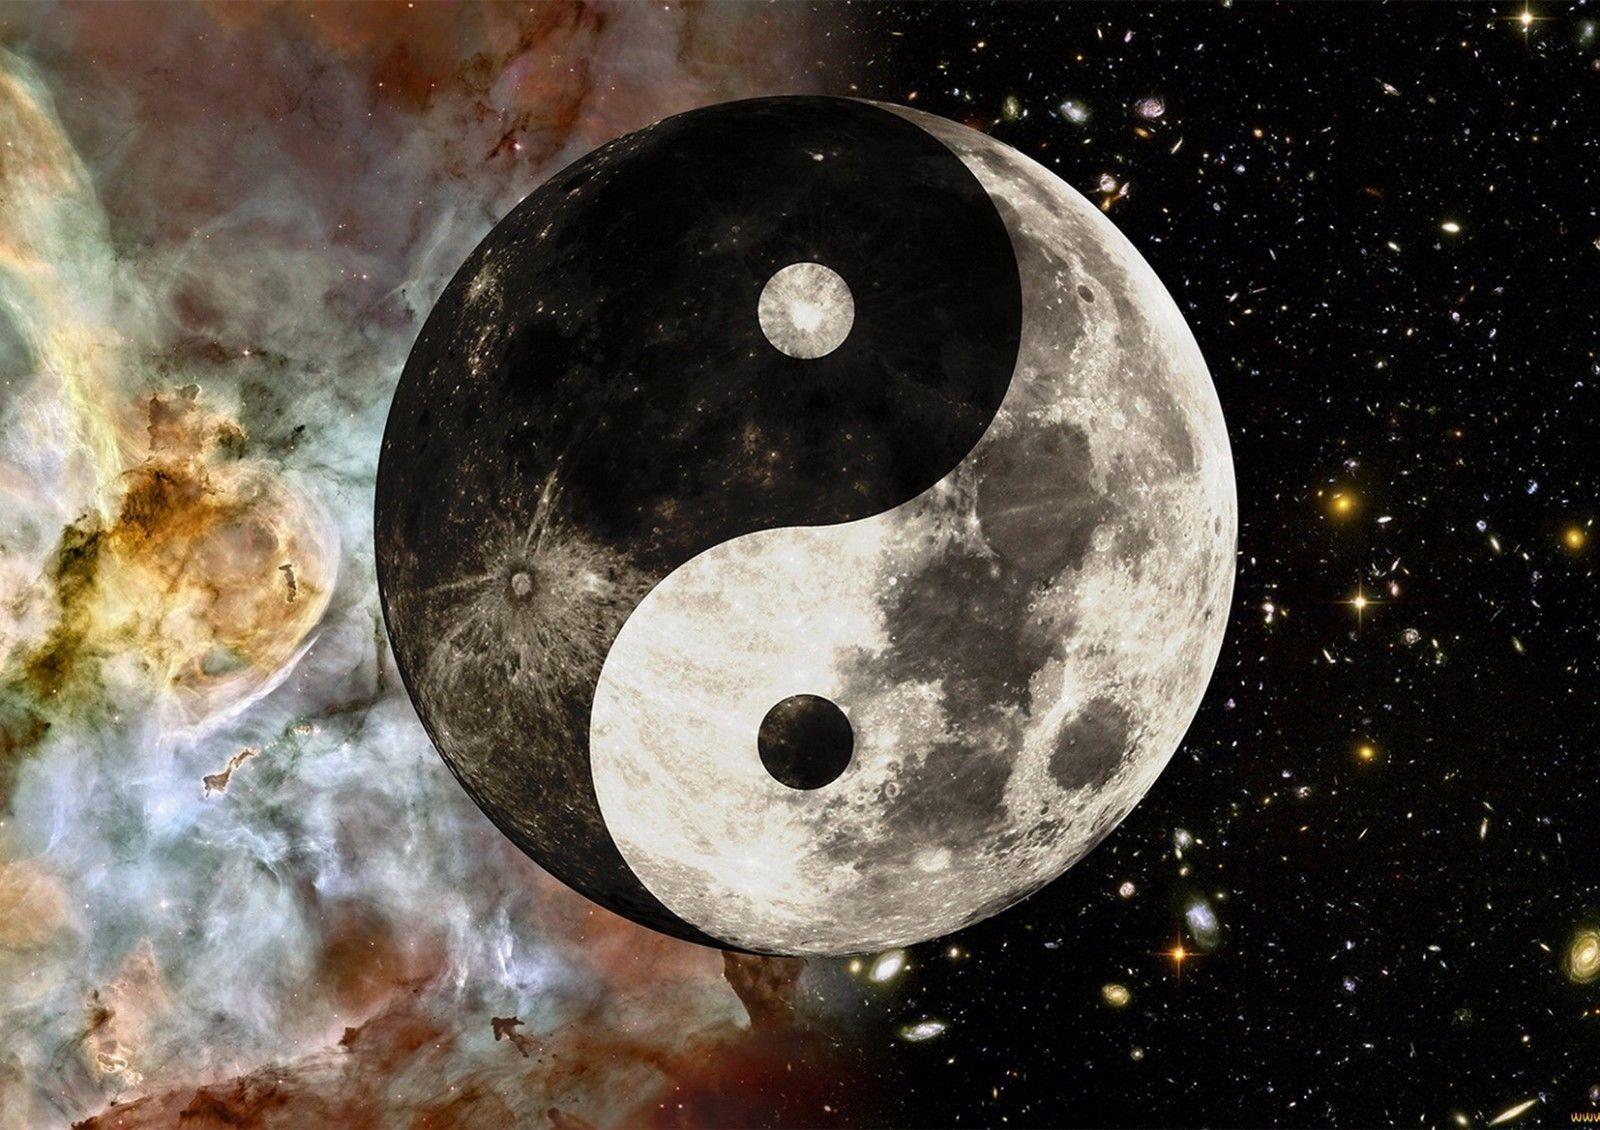 2019 Yin Yang Symbol Art Silk Print Poster 24x36inch60x90cm 018 From